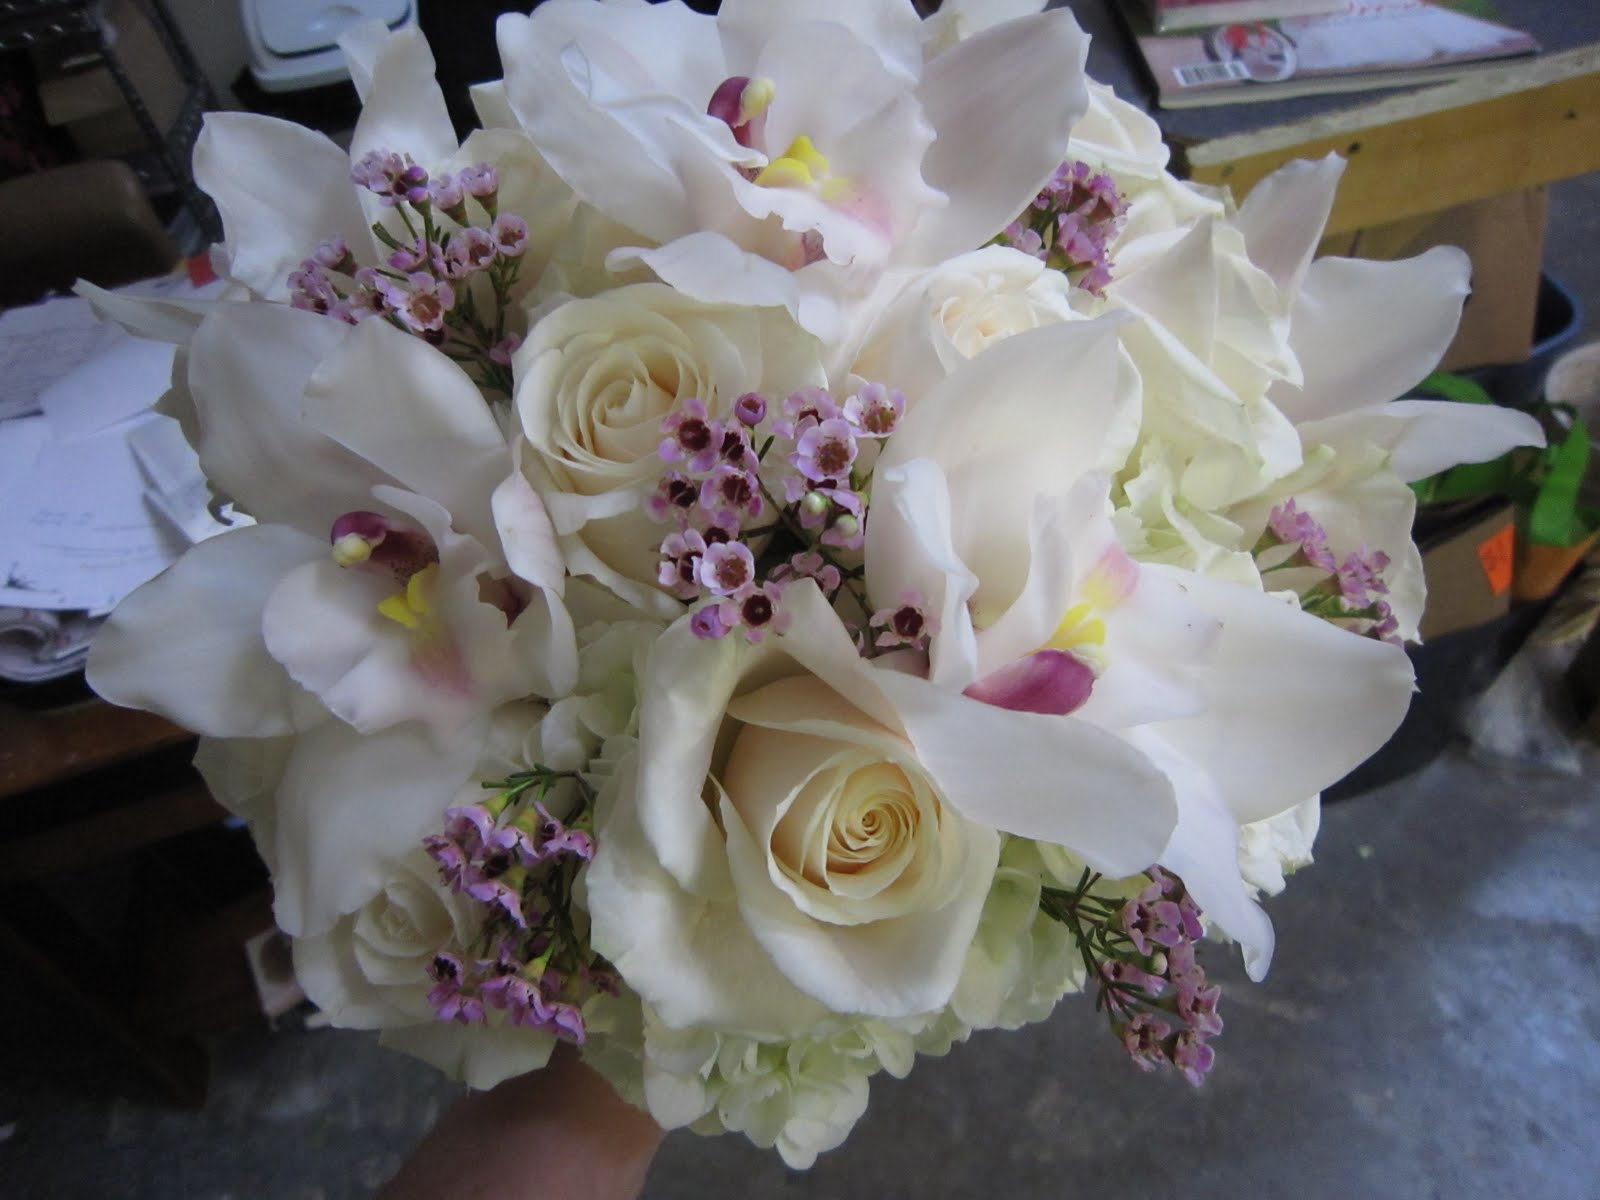 sisters floral design studio Such a Pretty Bouquet